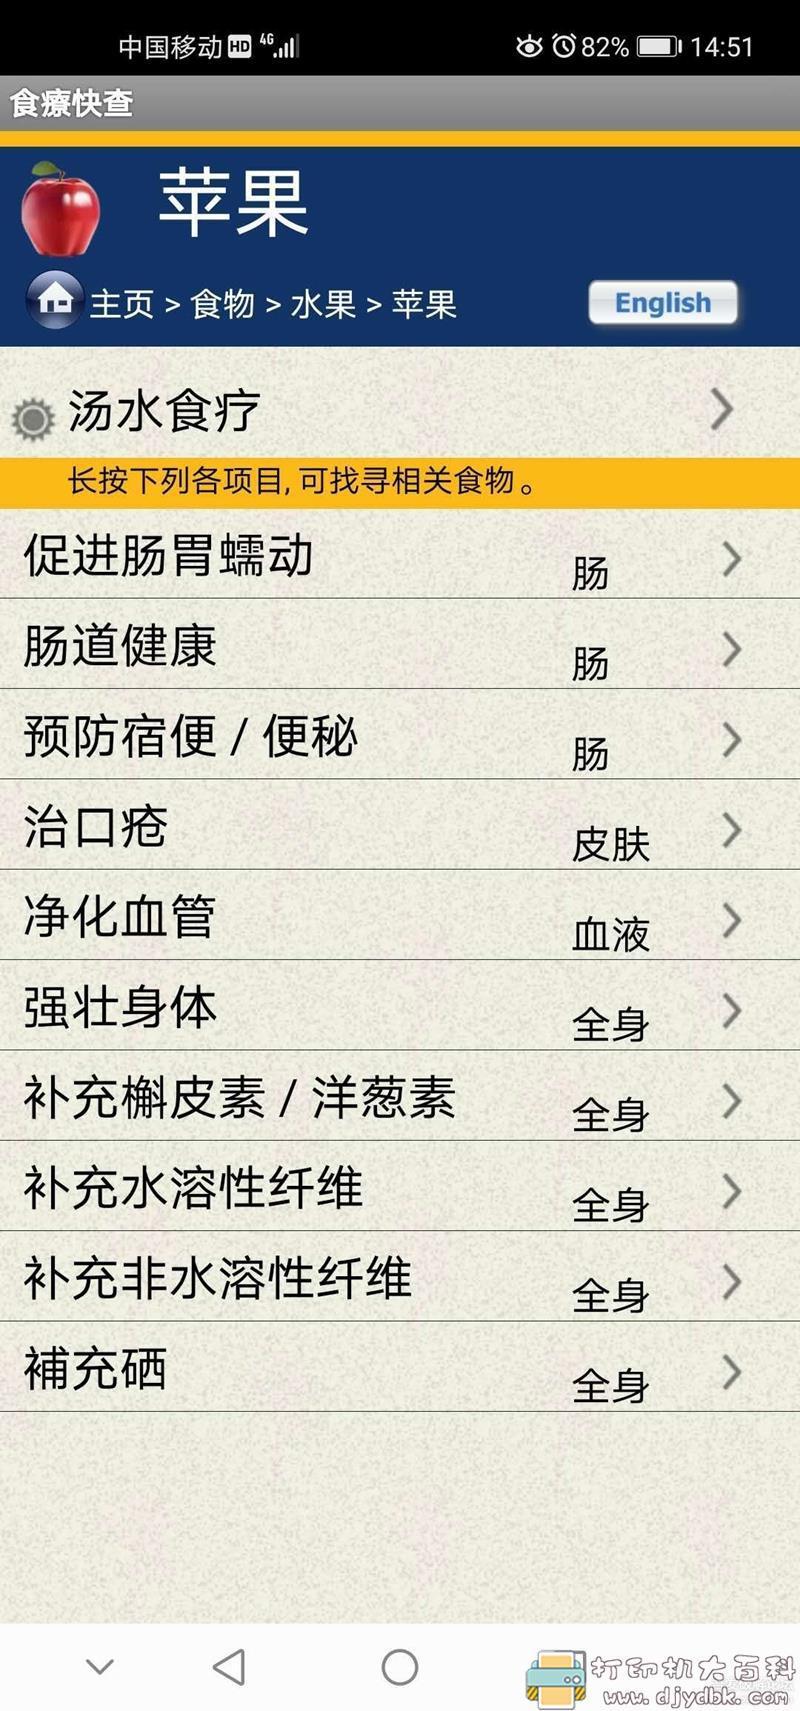 [Android]养生系列【食疗快查app】了解你吃的食物的特性图片 No.5